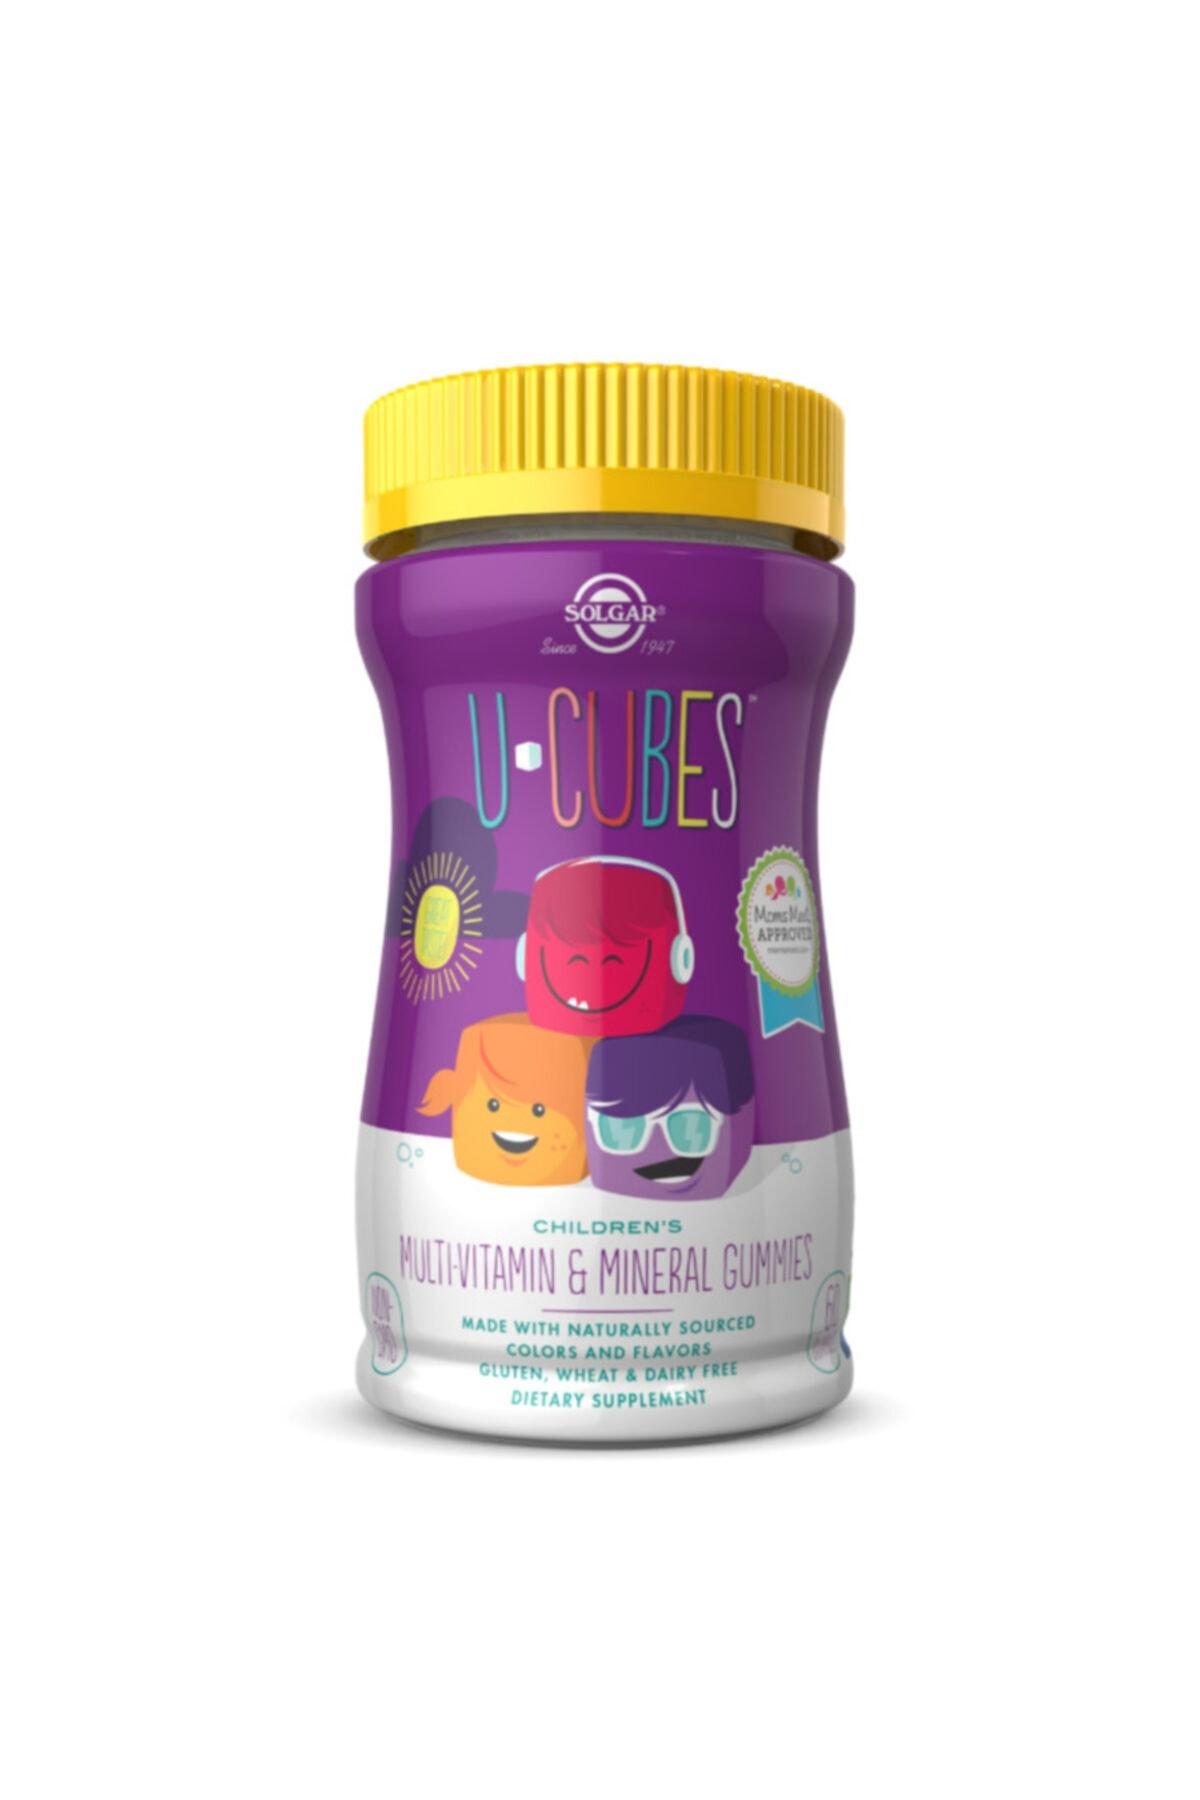 Solgar U-cubes Children's Multi-vitamin & Mineral 60 Gummies 1